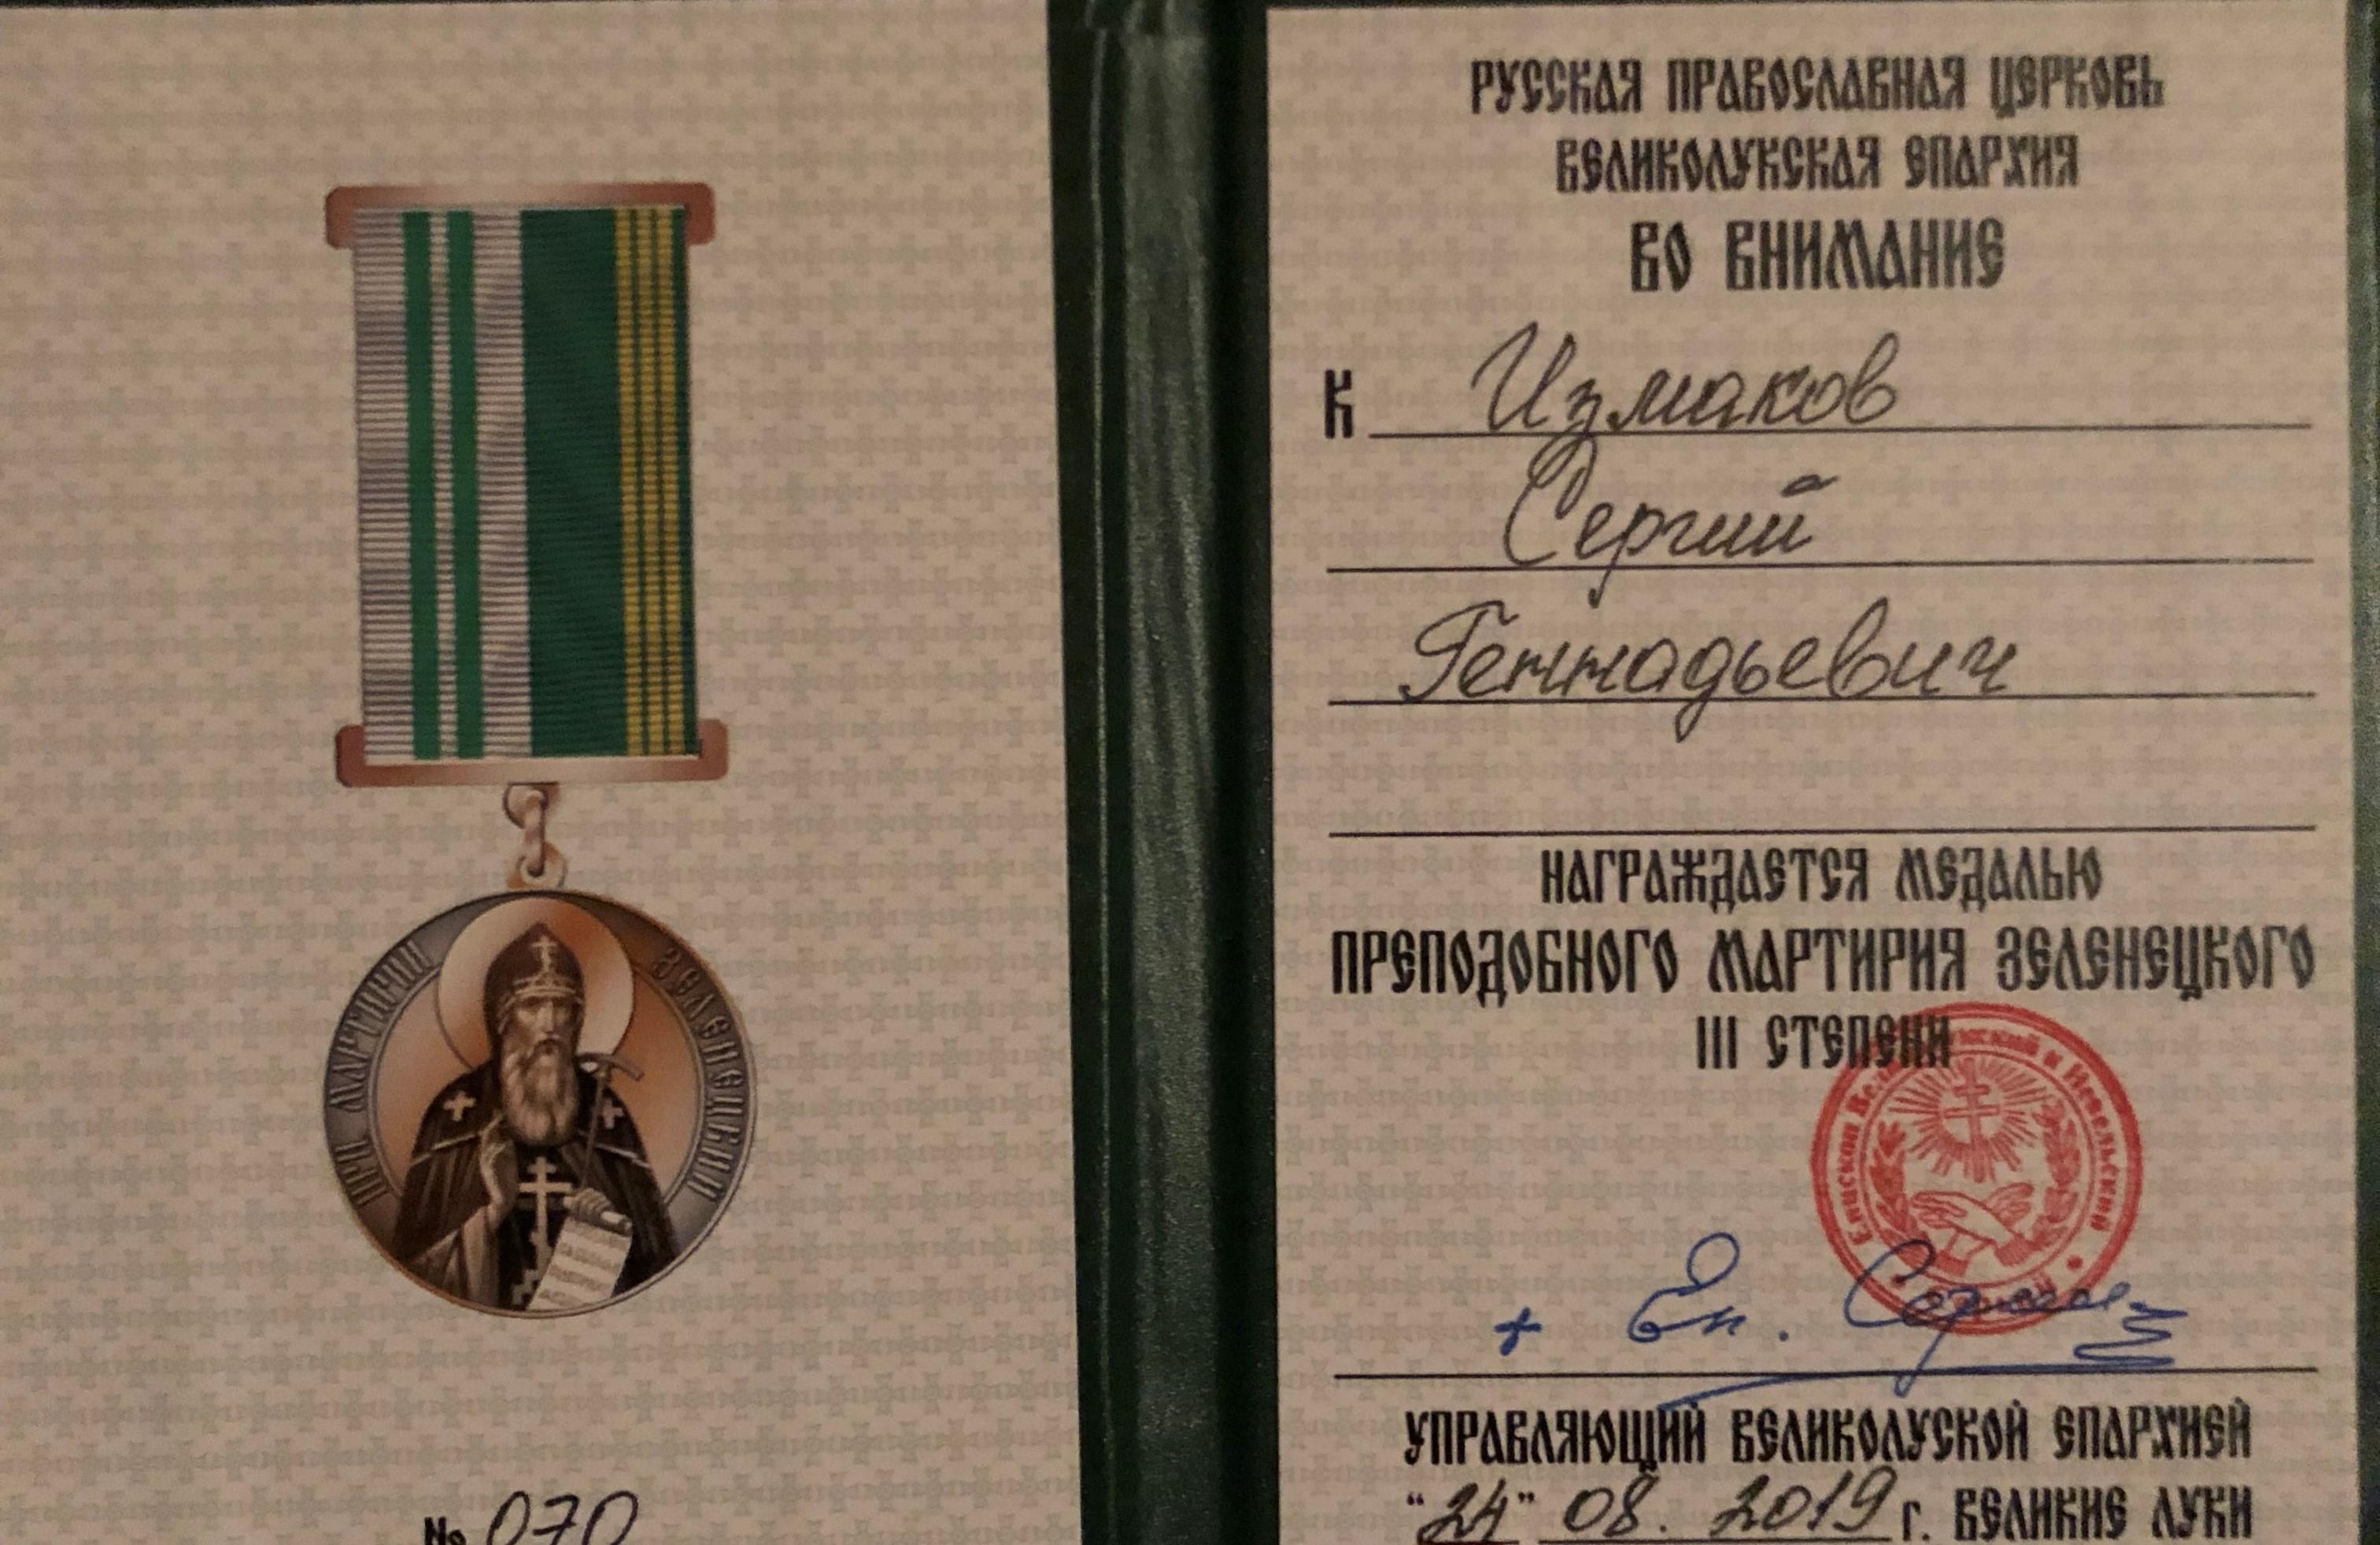 Мартирия Зеленецкого III